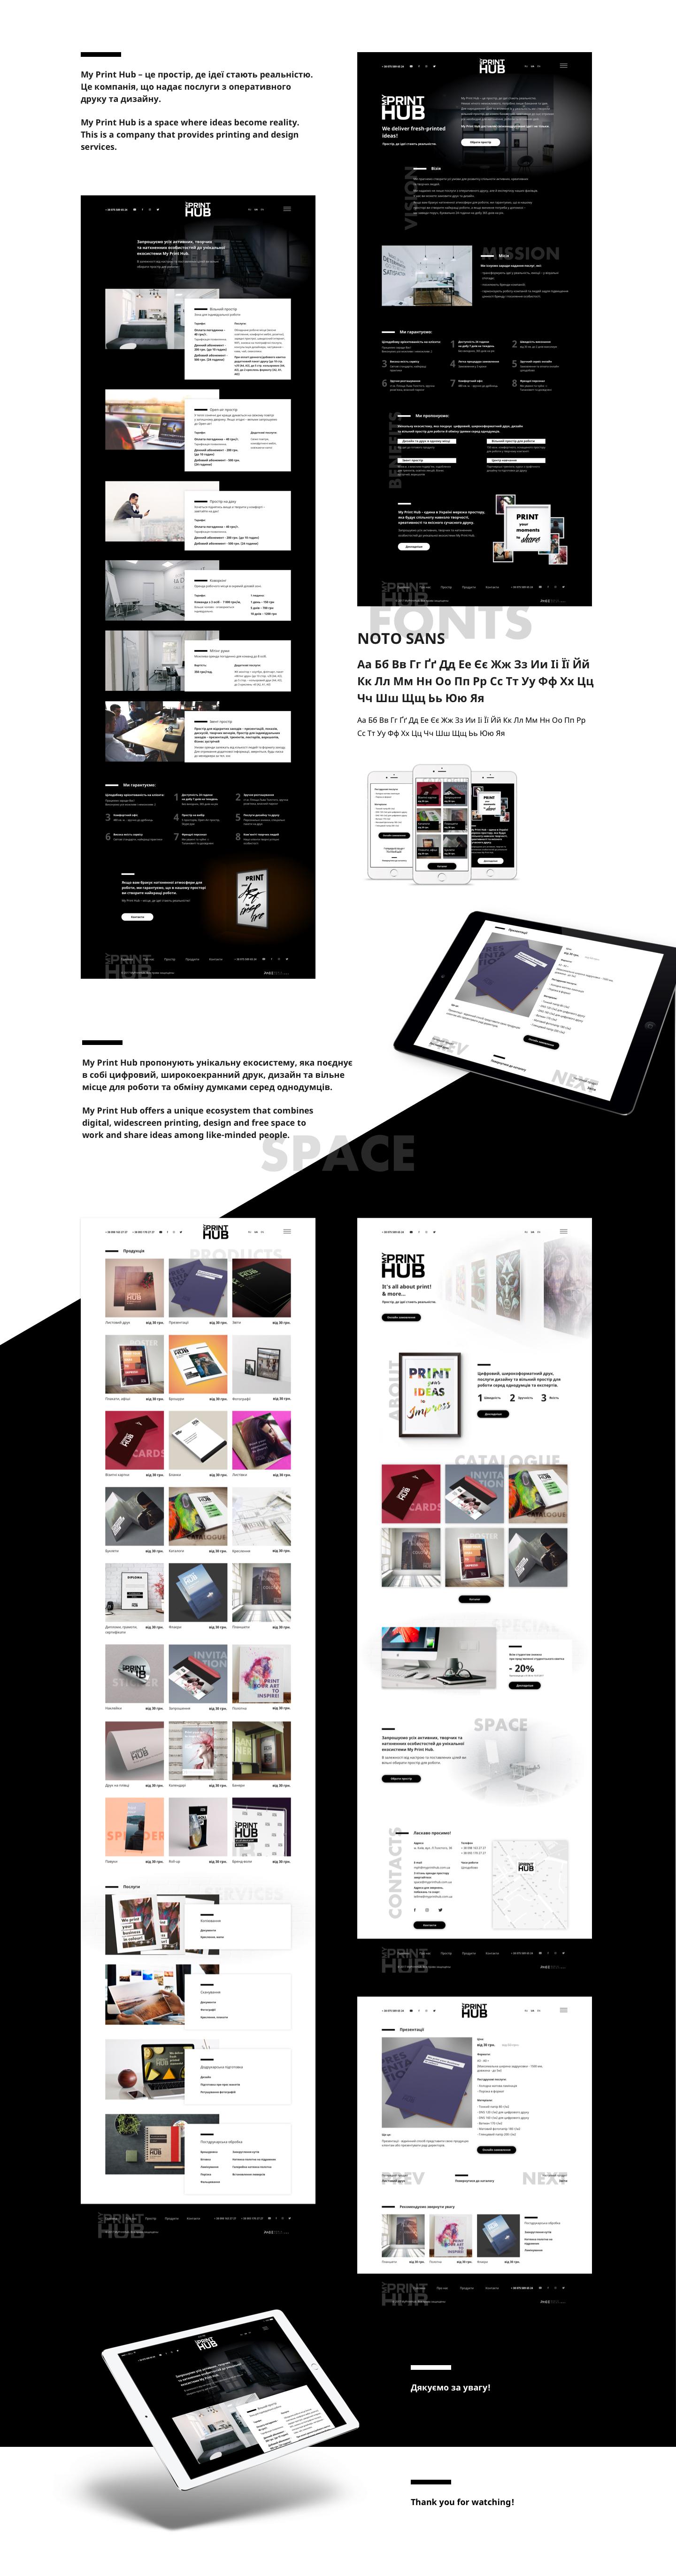 My Print Hub